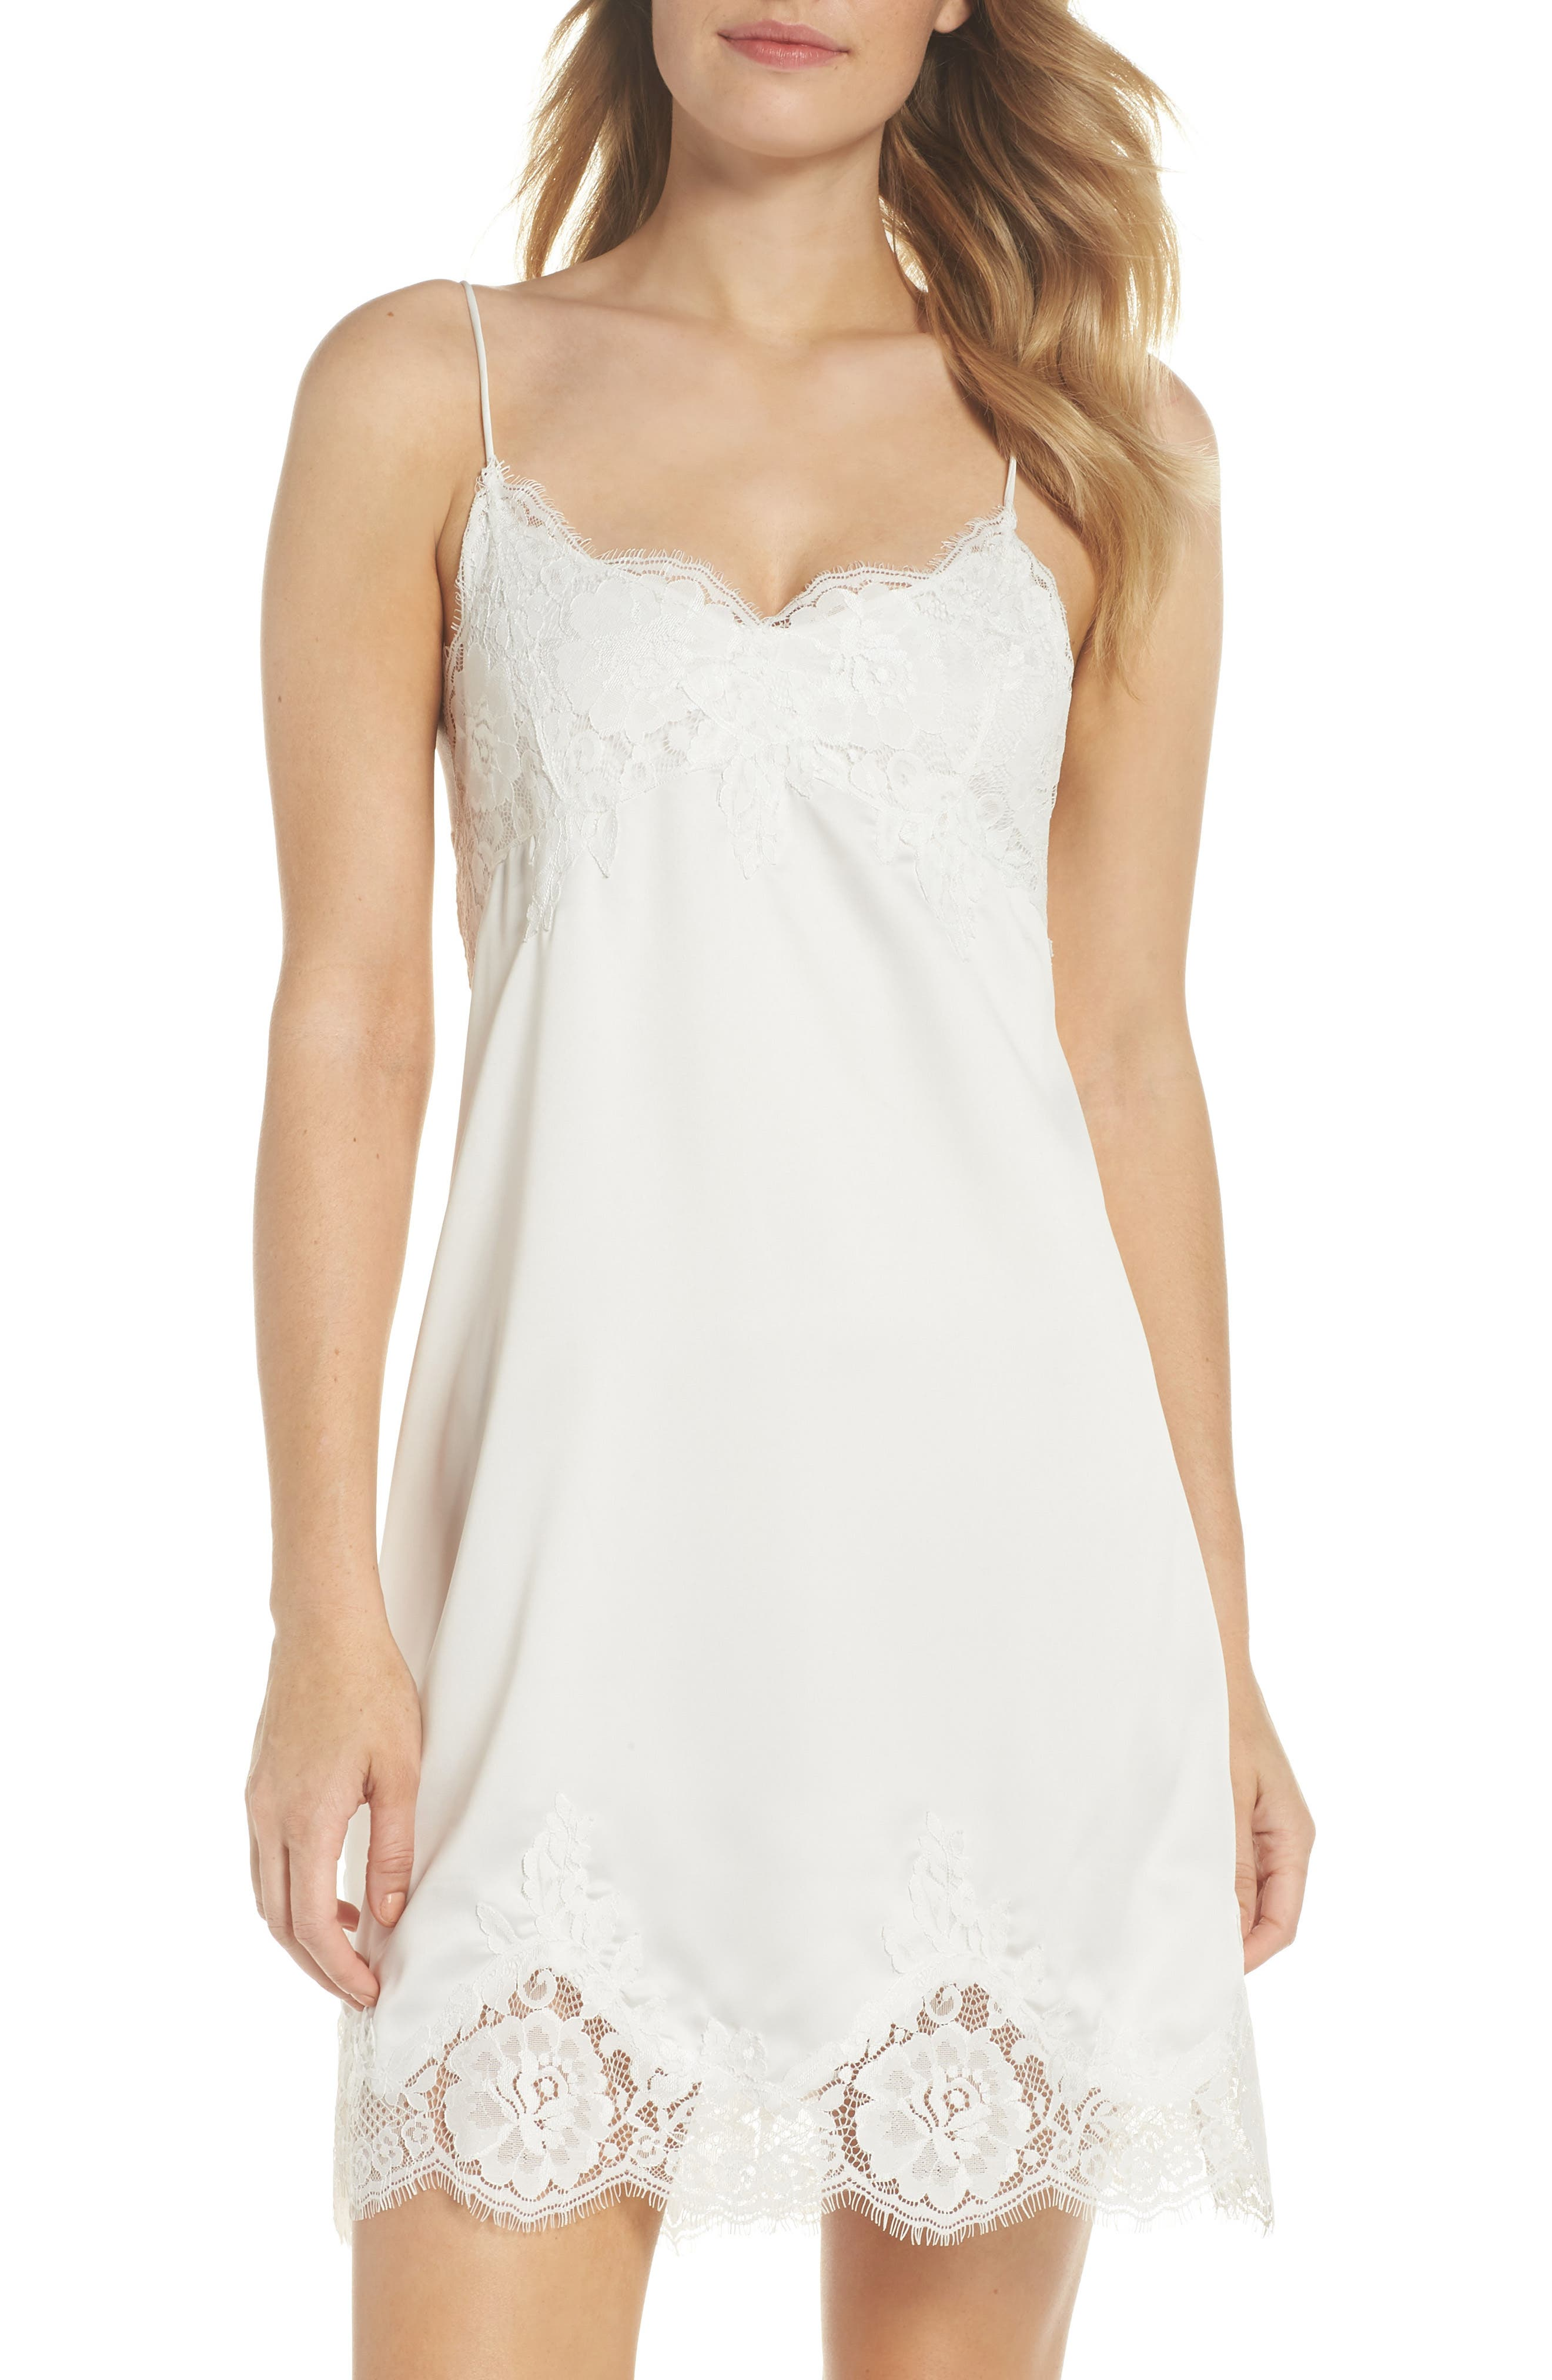 1920s Style Underwear, Lingerie, Nightgowns, Pajamas Womens Homebodii Olivia Chemise Size XX-Large - White $79.95 AT vintagedancer.com